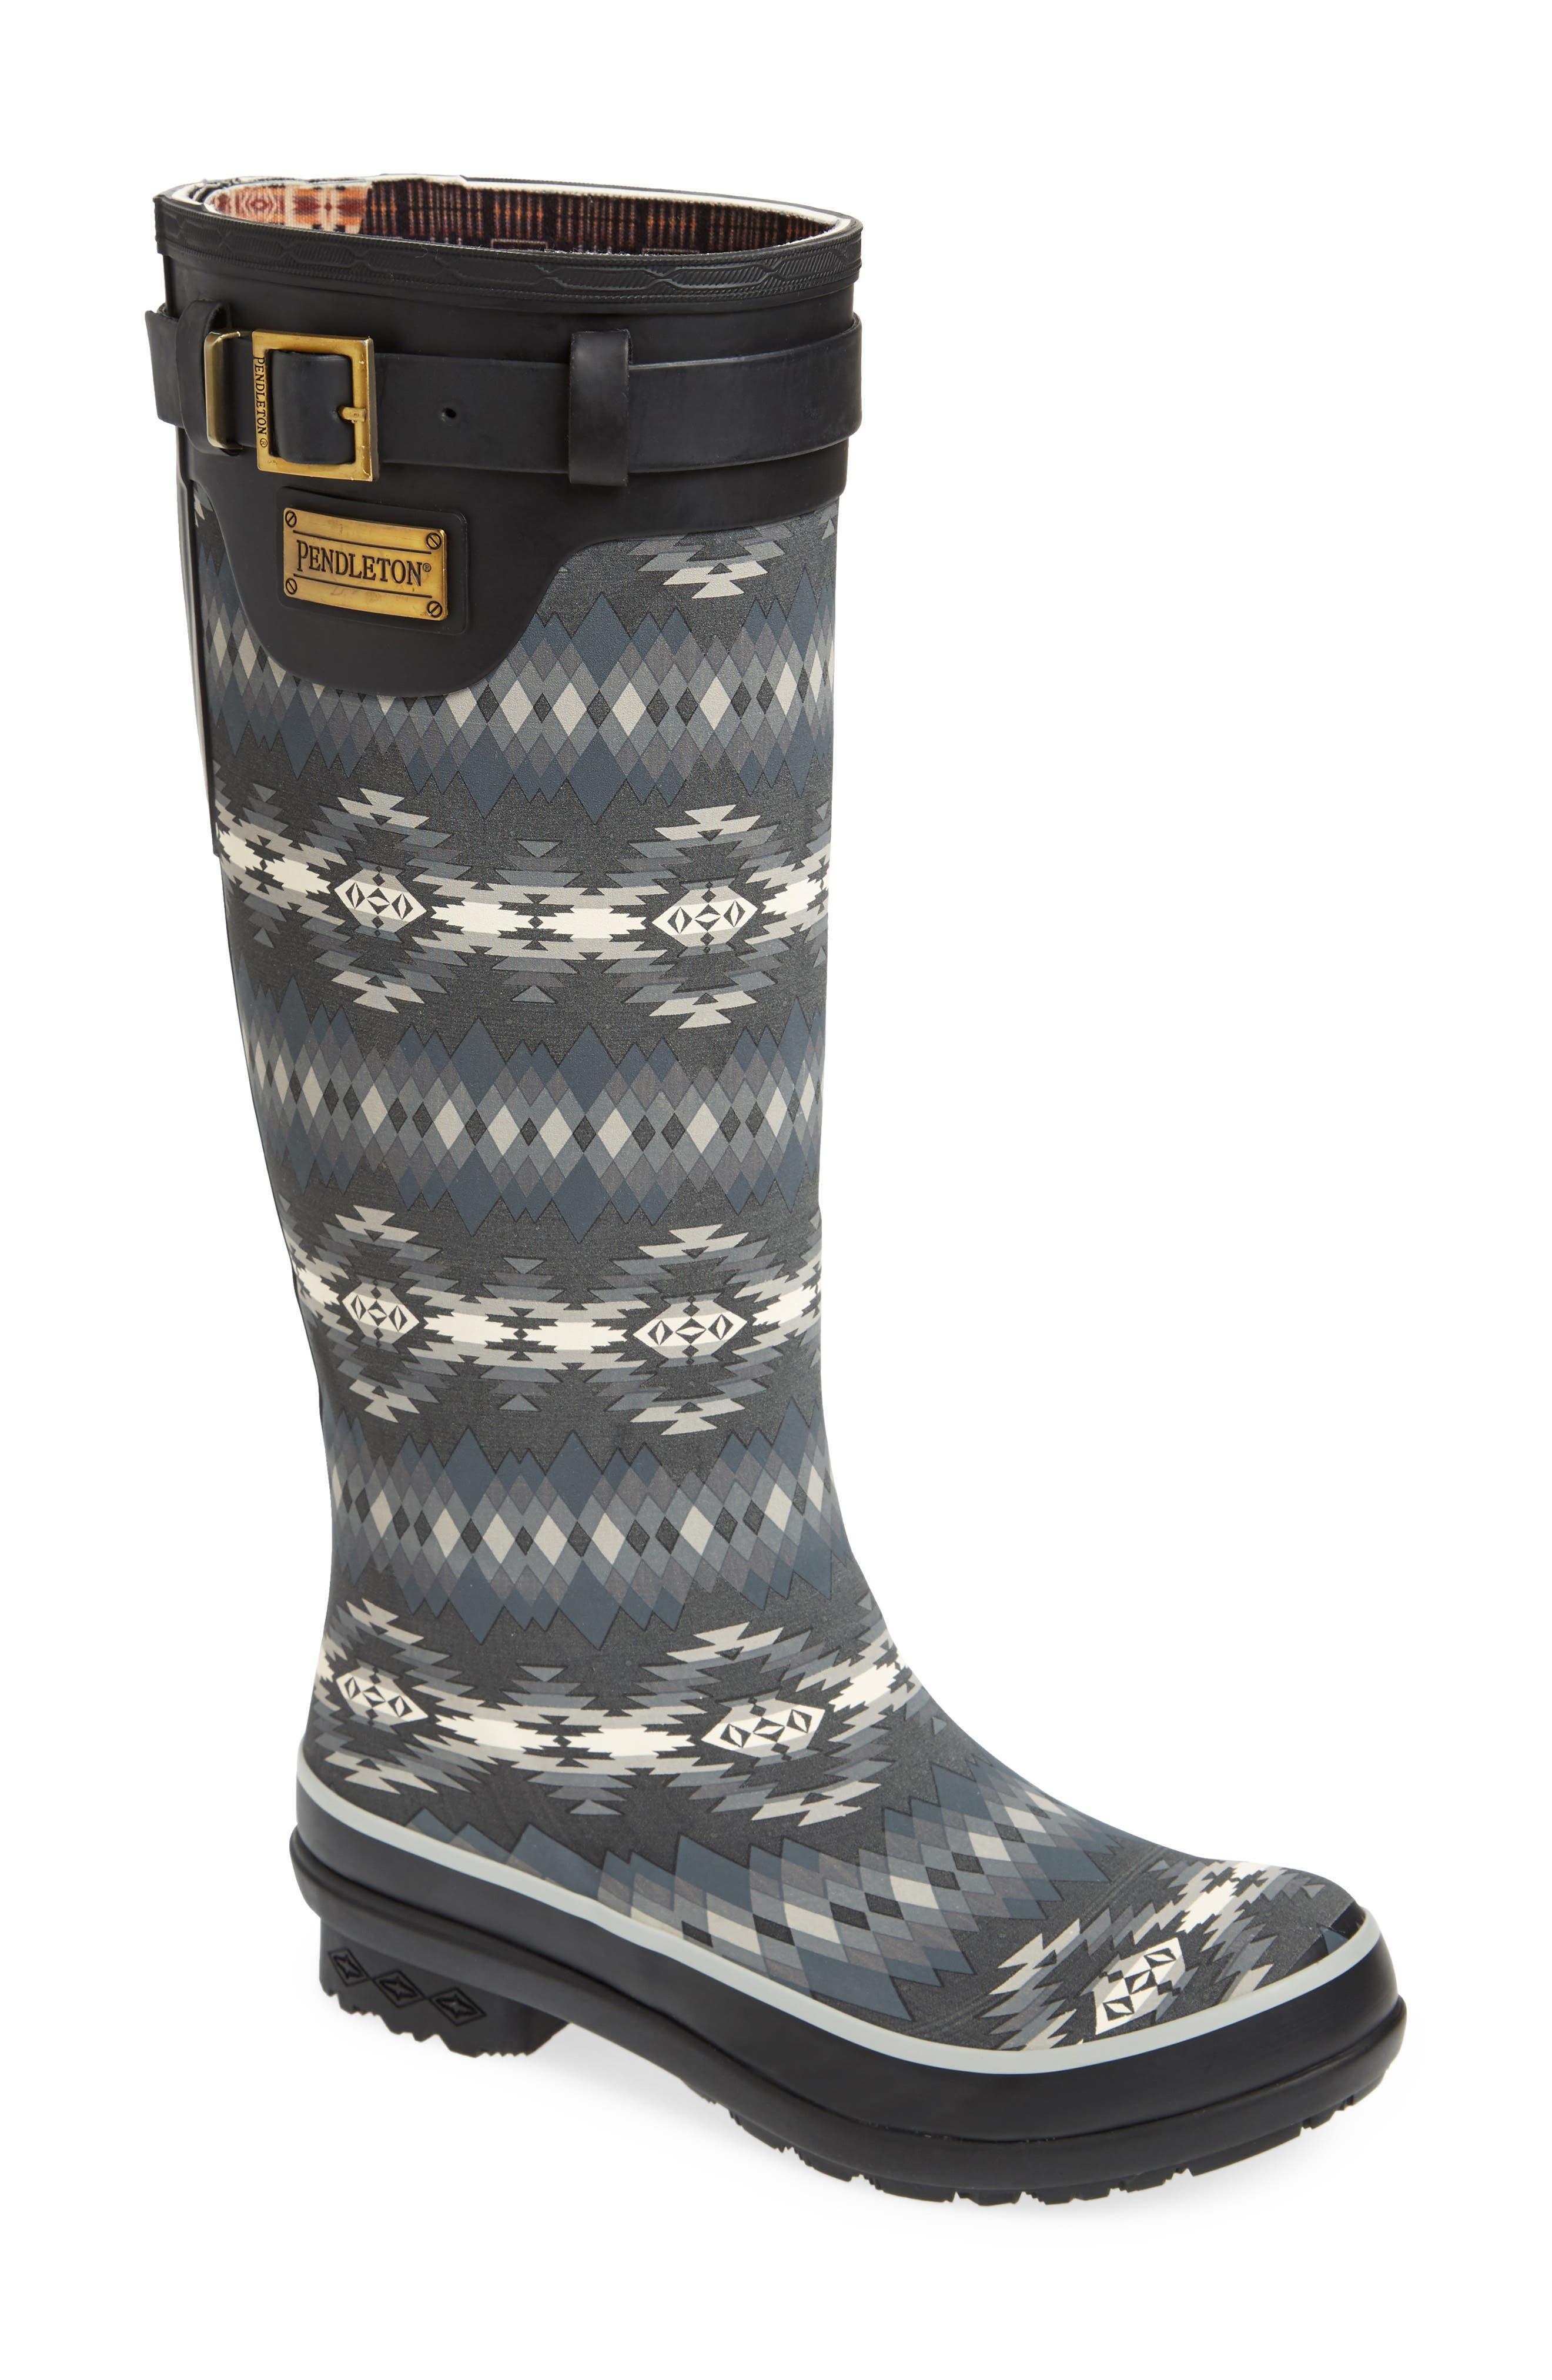 Pendleton Papago Park Tall Rain Boot,                             Main thumbnail 1, color,                             BLACK